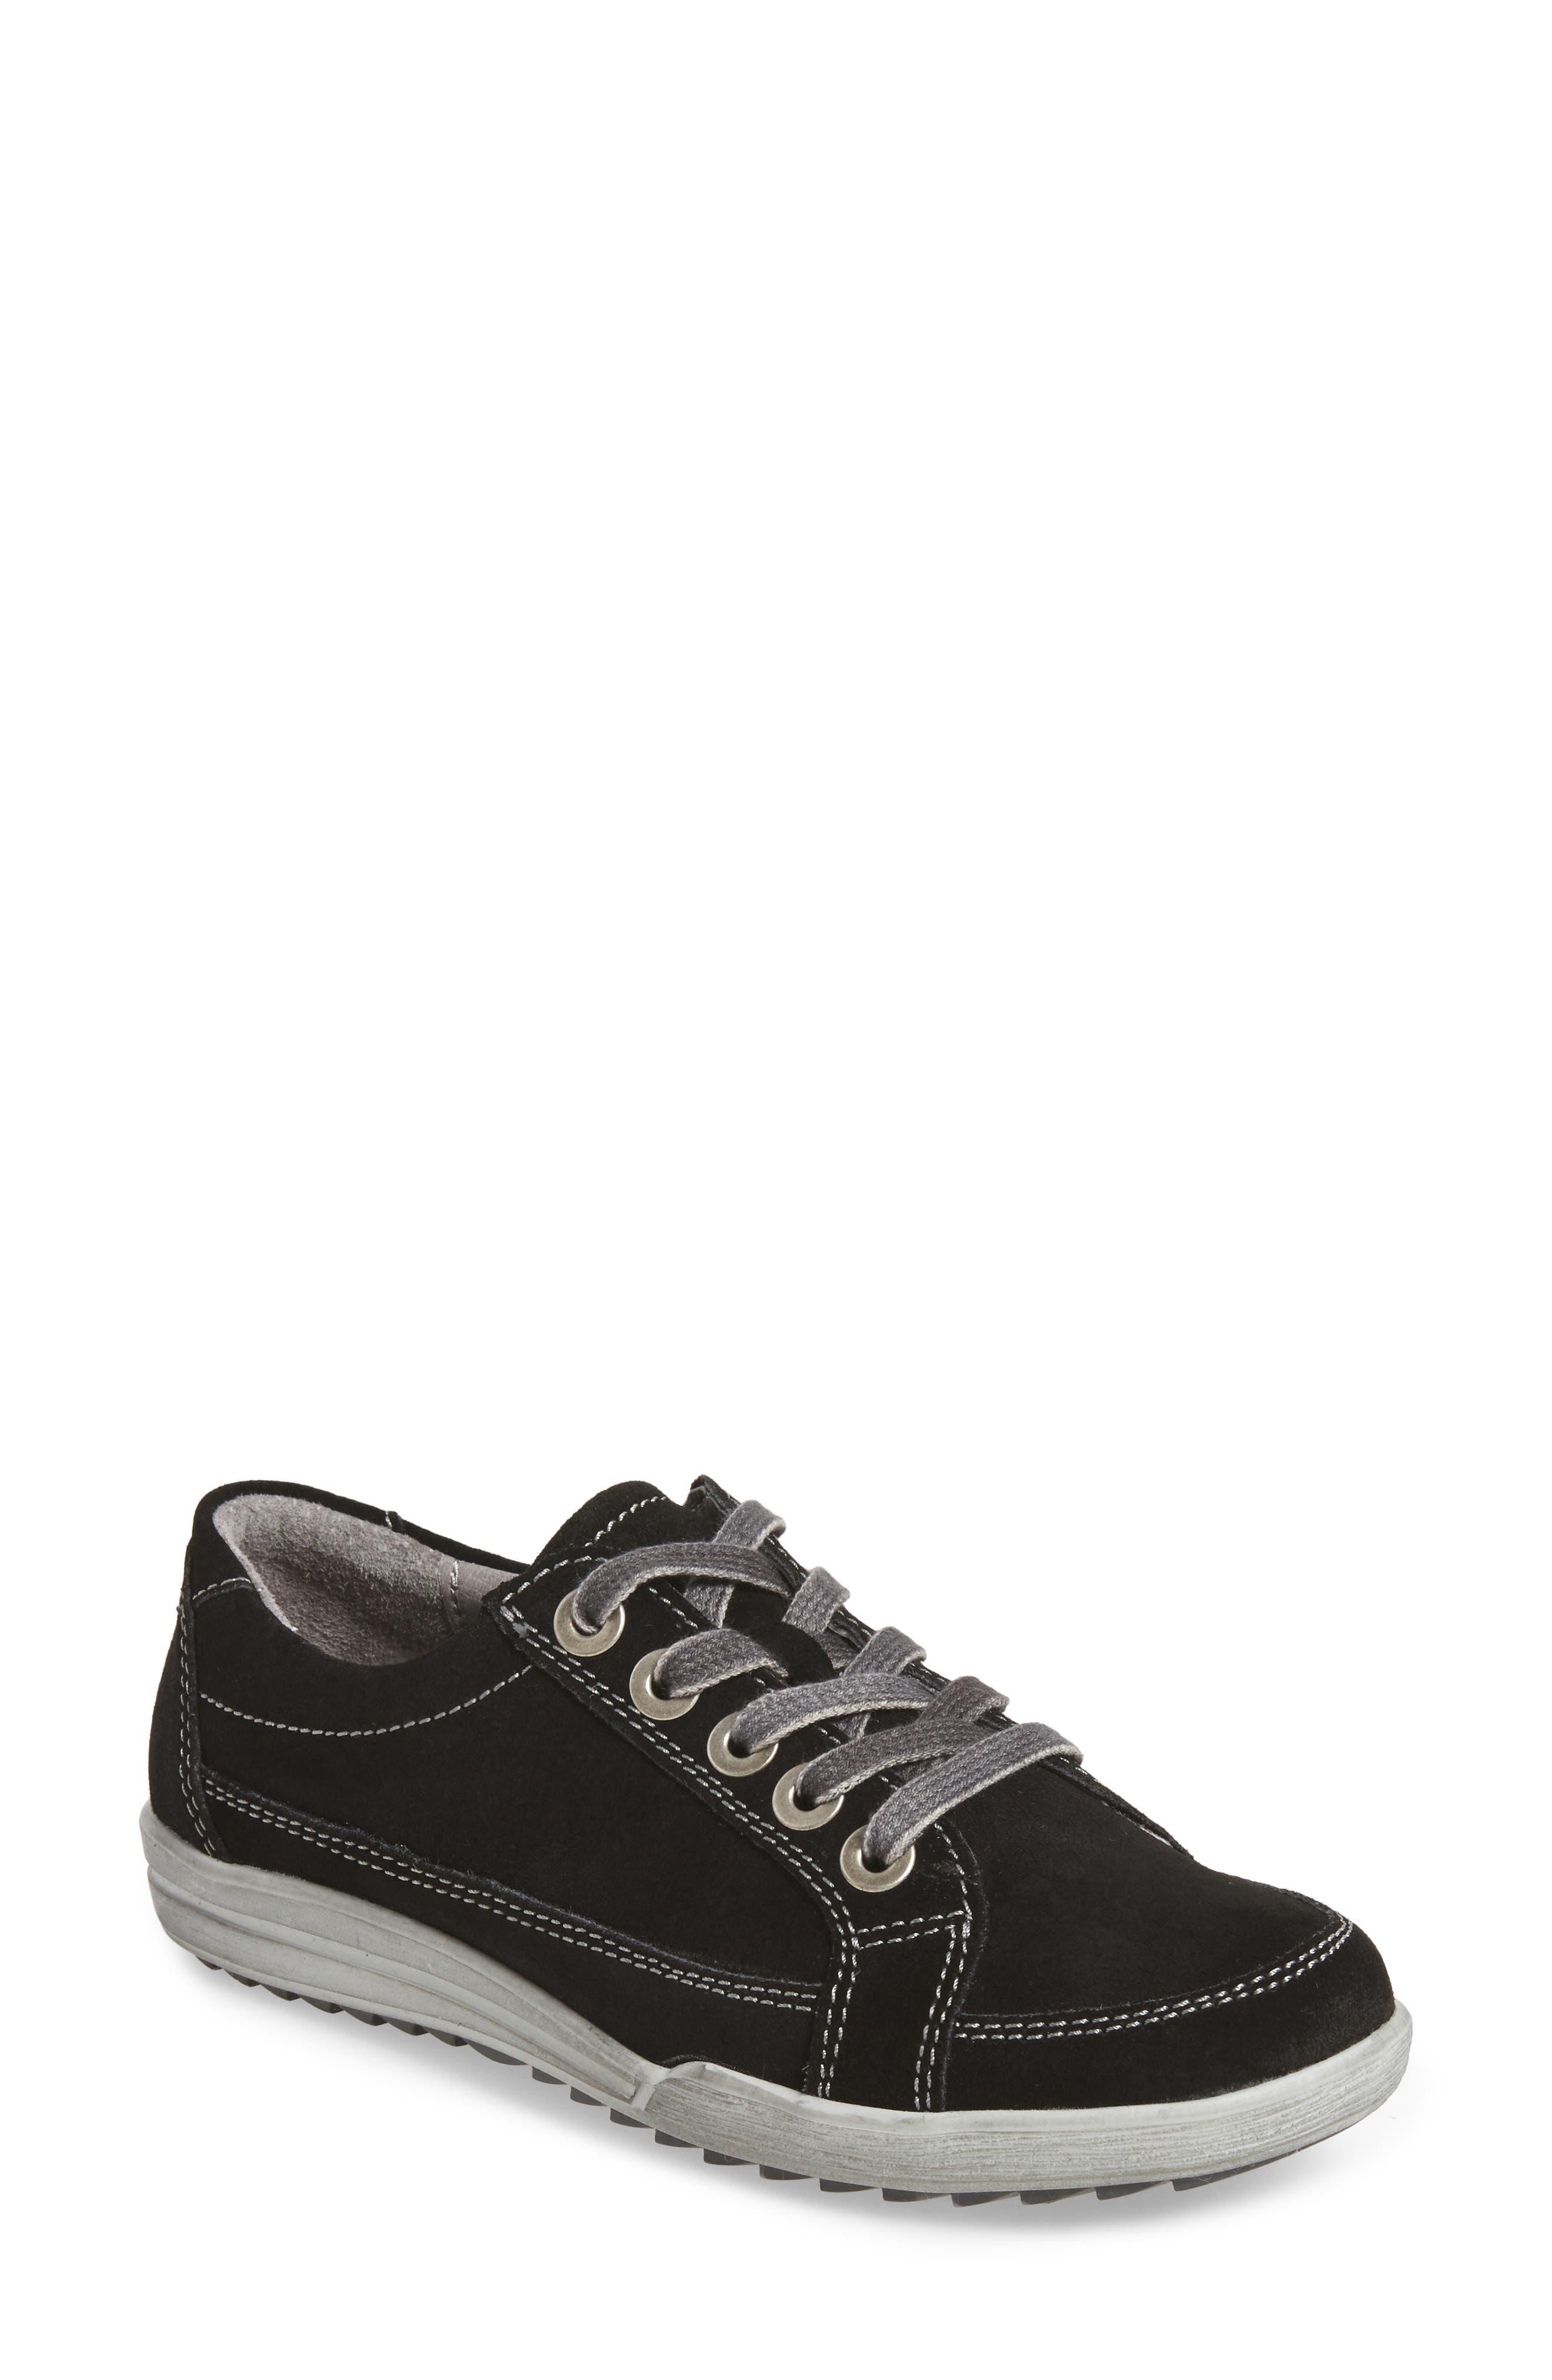 Main Image - Josef Seibel Dany 57 Sneaker (Women)